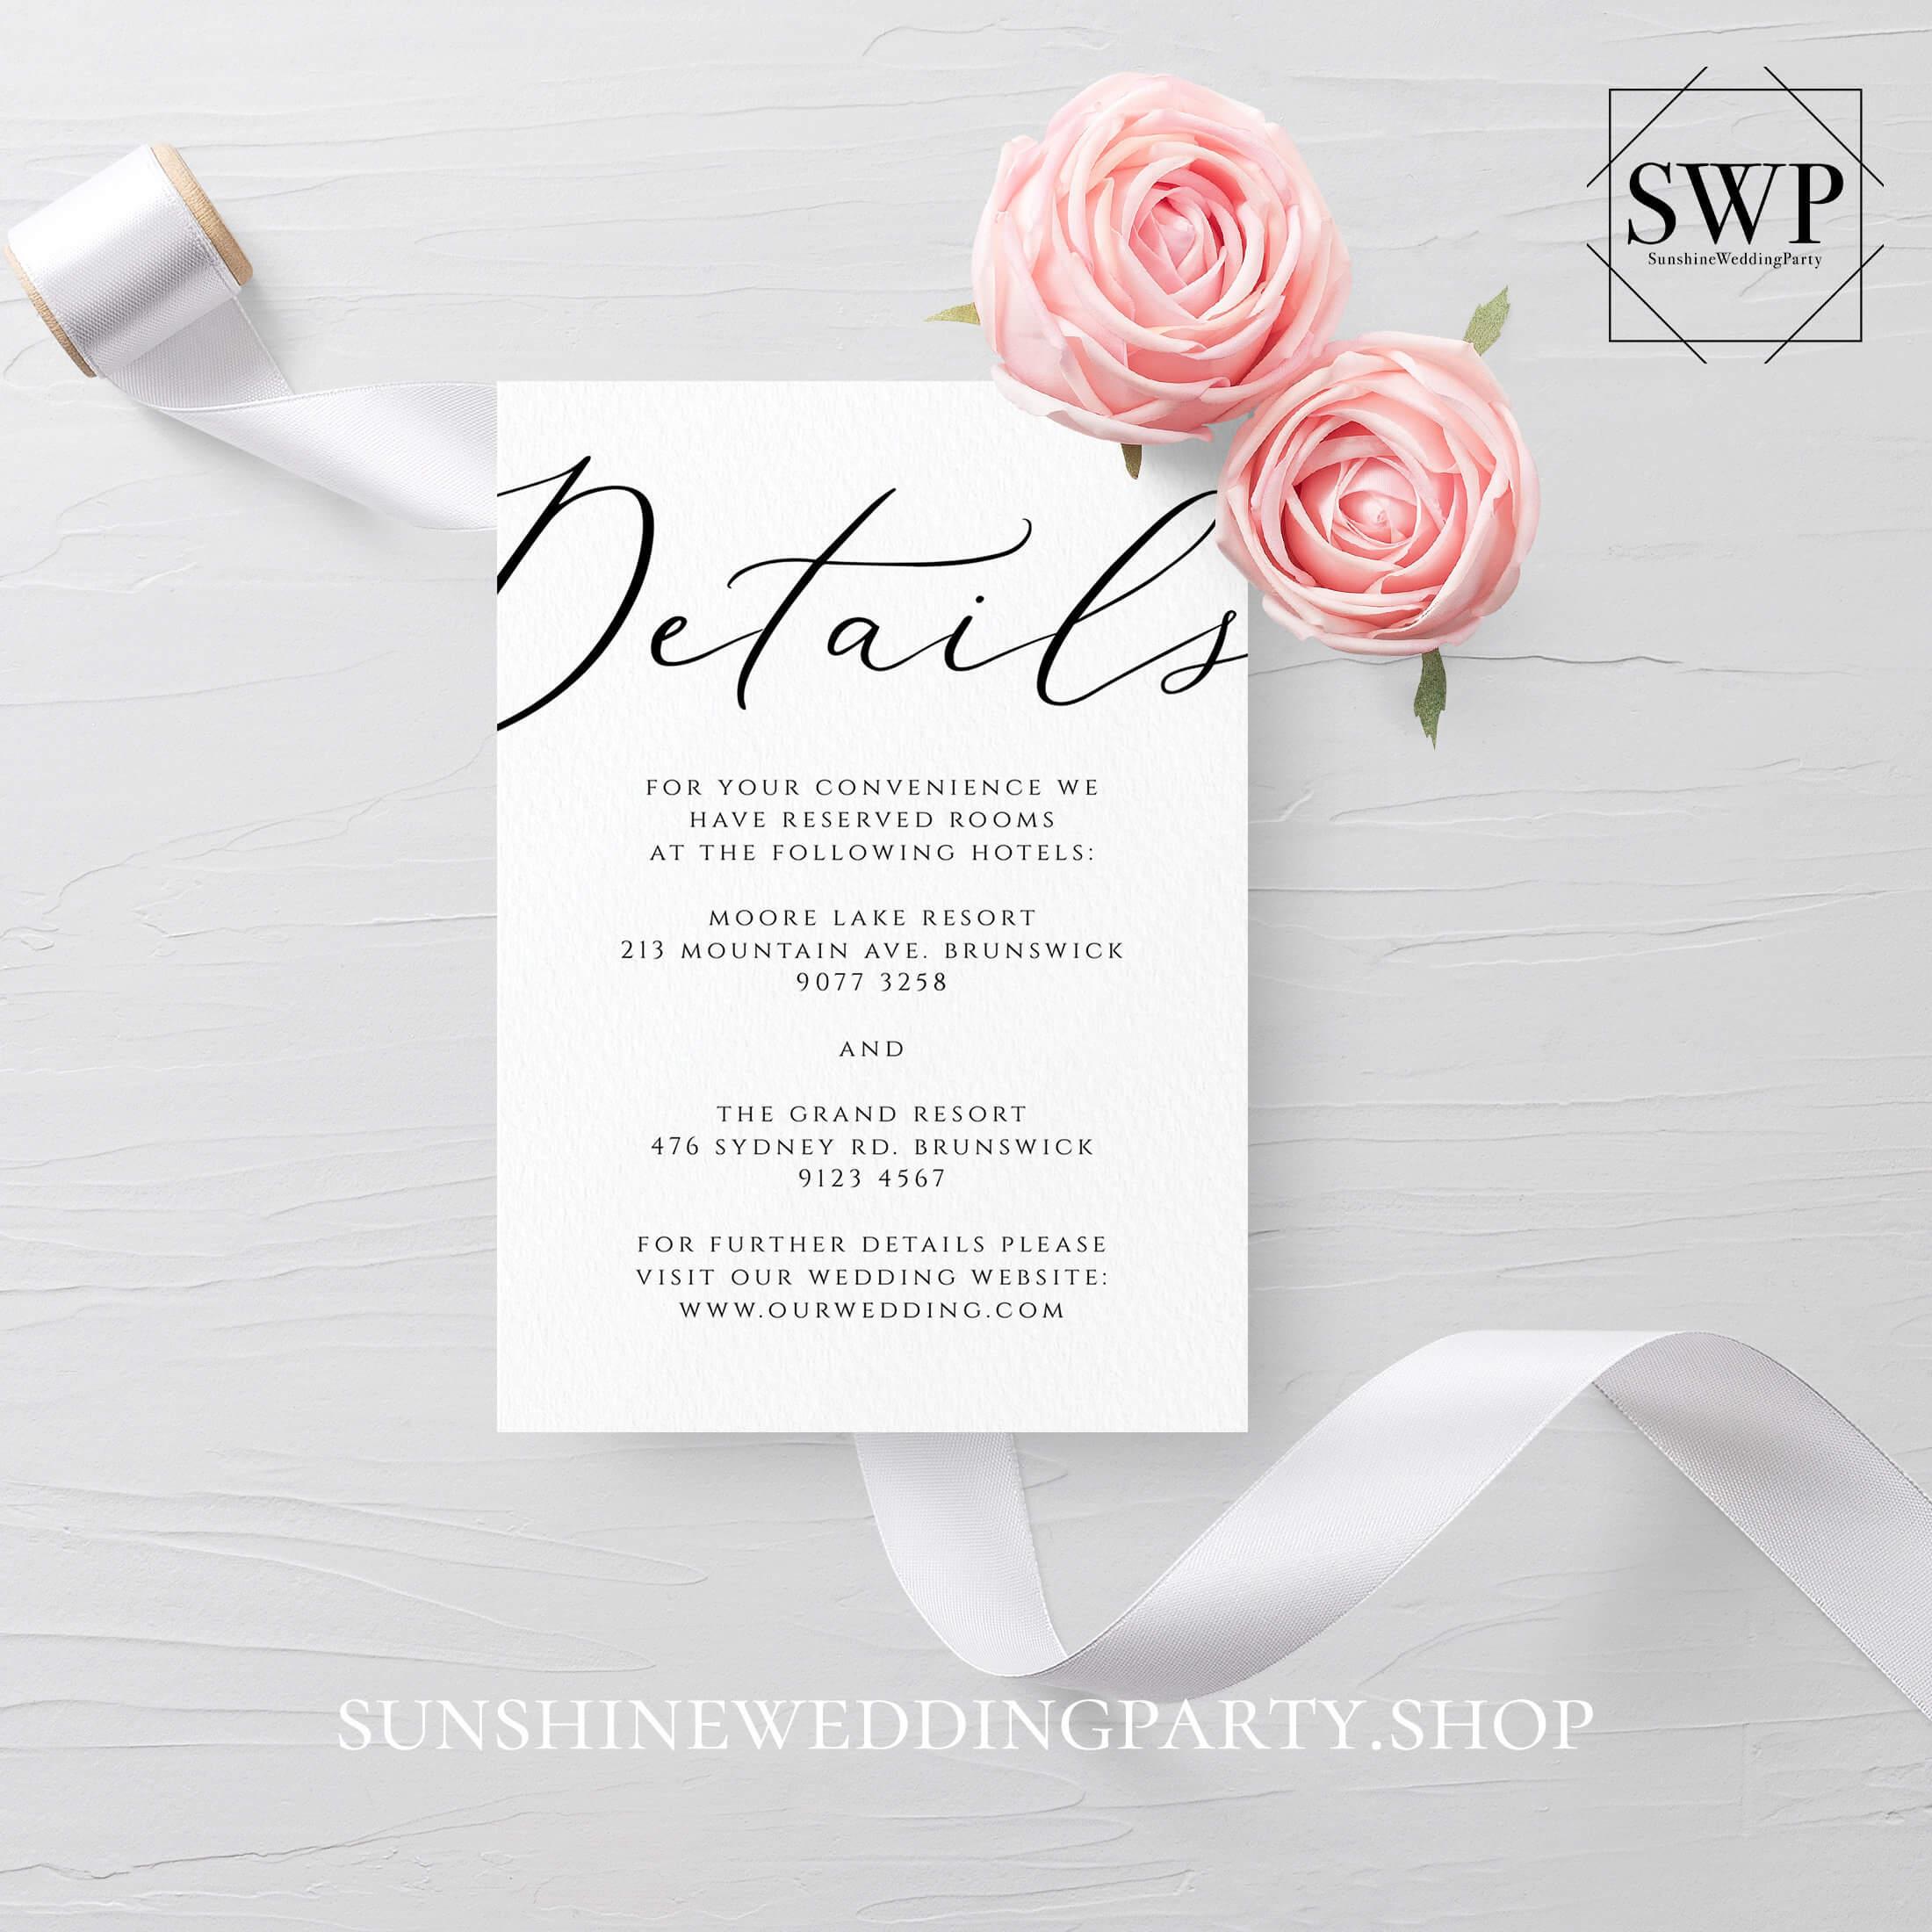 Wedding Details Card Template Fully Editable Printable Regarding Wedding Hotel Information Card Template